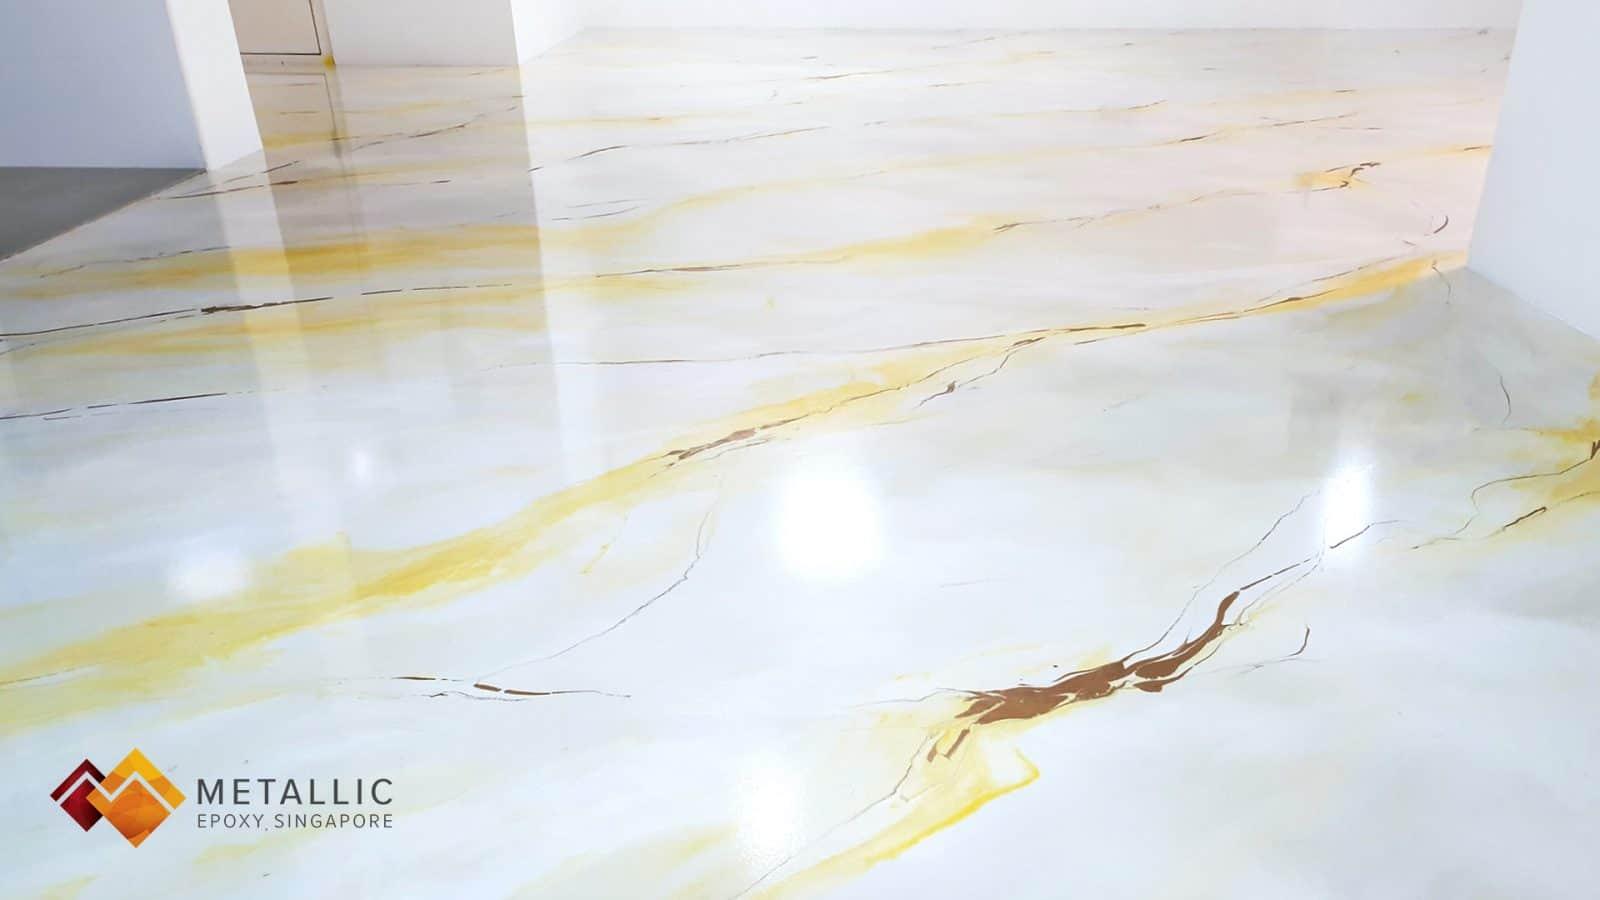 Metallic Epoxy Singapore Lemon Yellow Marble Flooring